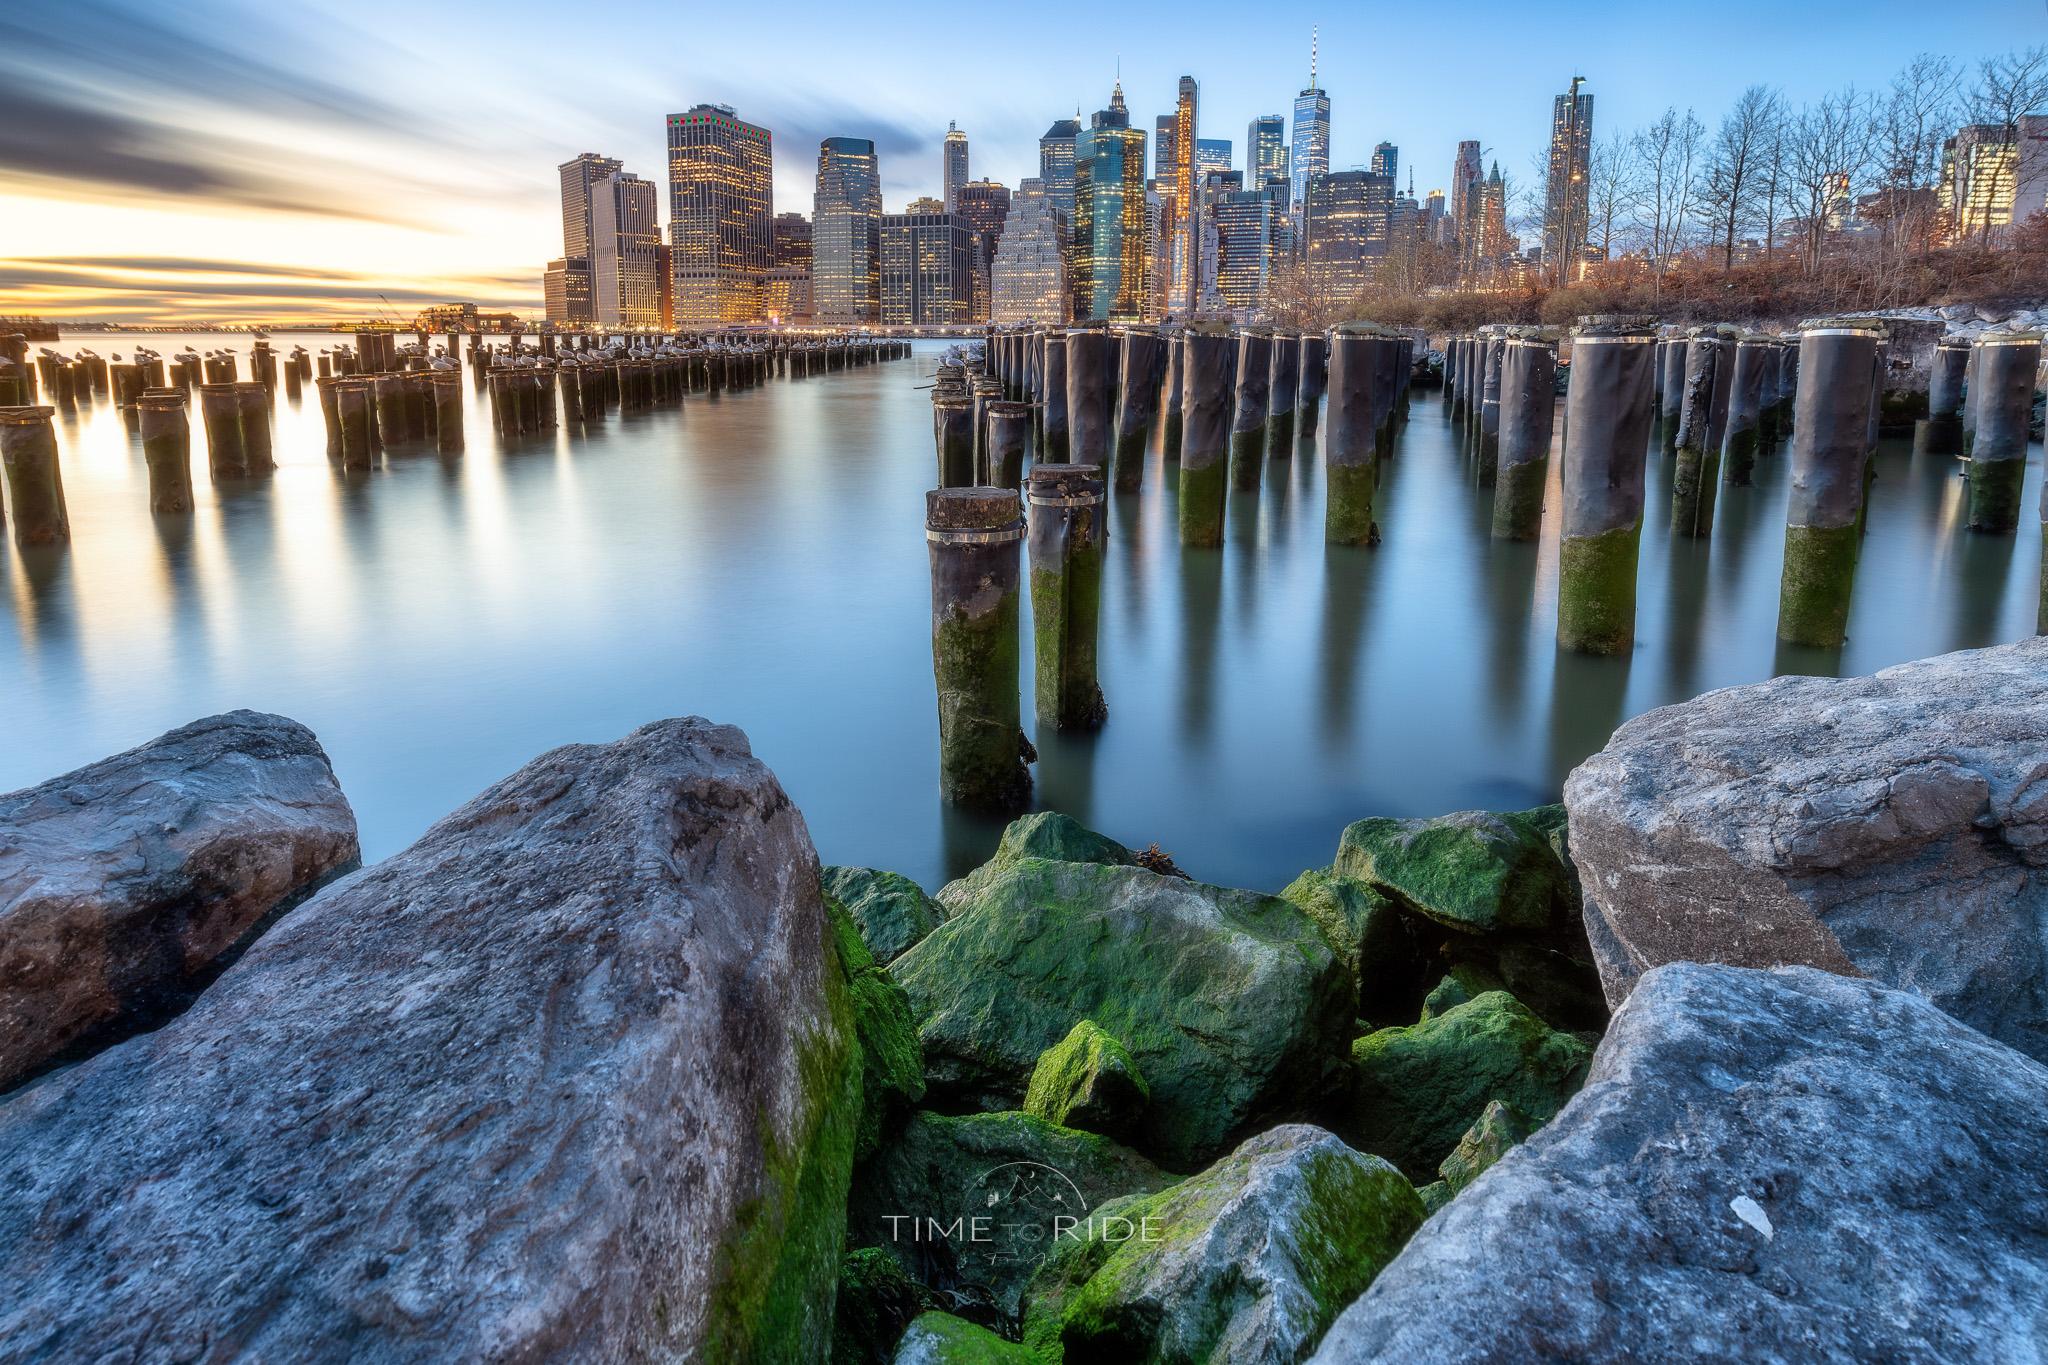 Skyline of Manhattan - New York City (USA), USA